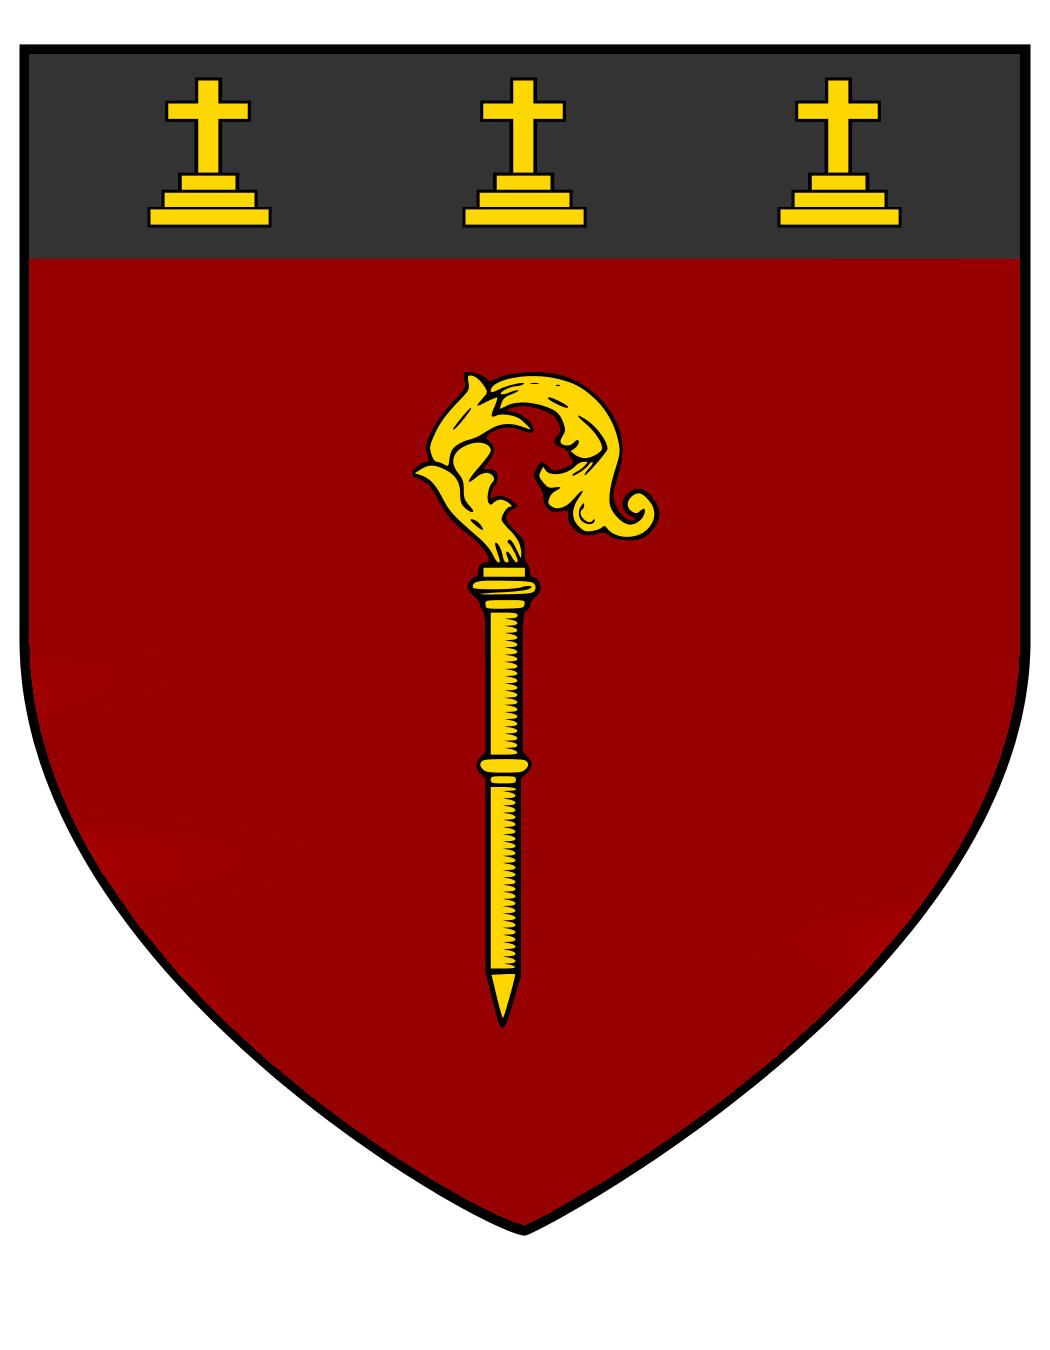 coat_of_arms_Thietmar_of_Merseburg.png